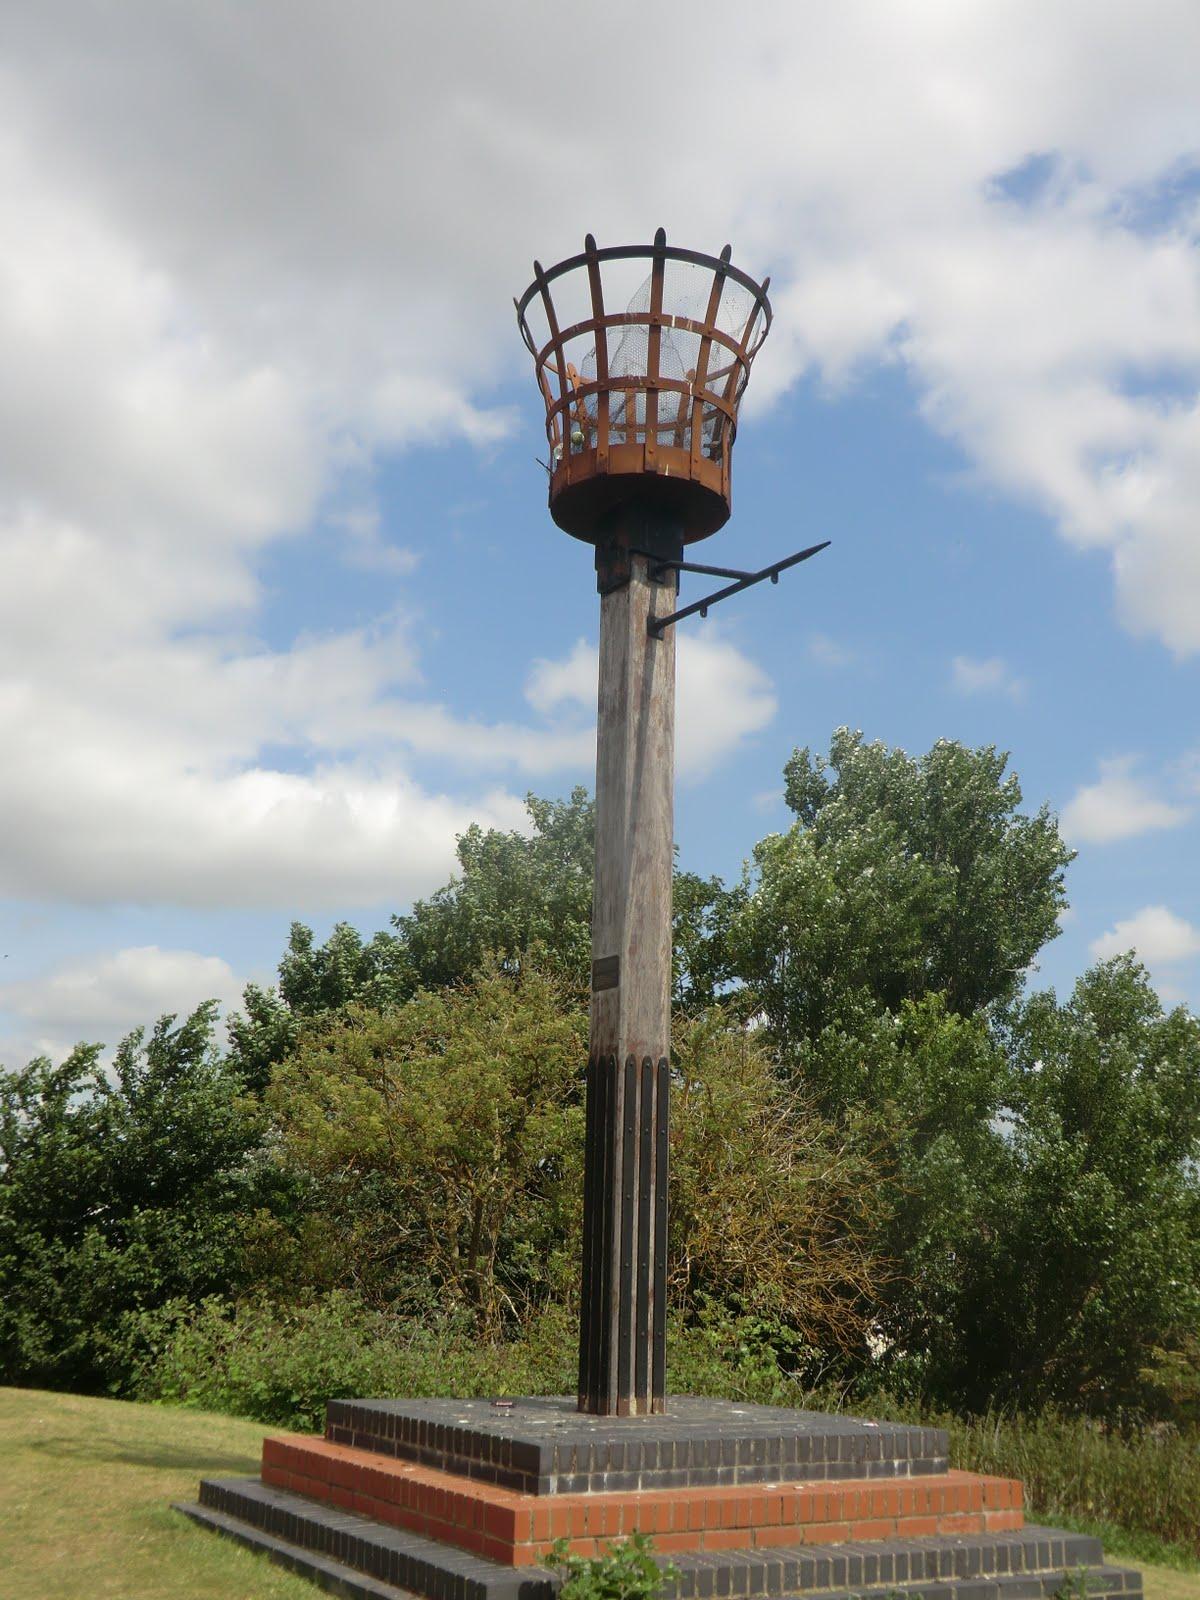 CIMG8905 Beacon on Castle Hills, Huntingdon